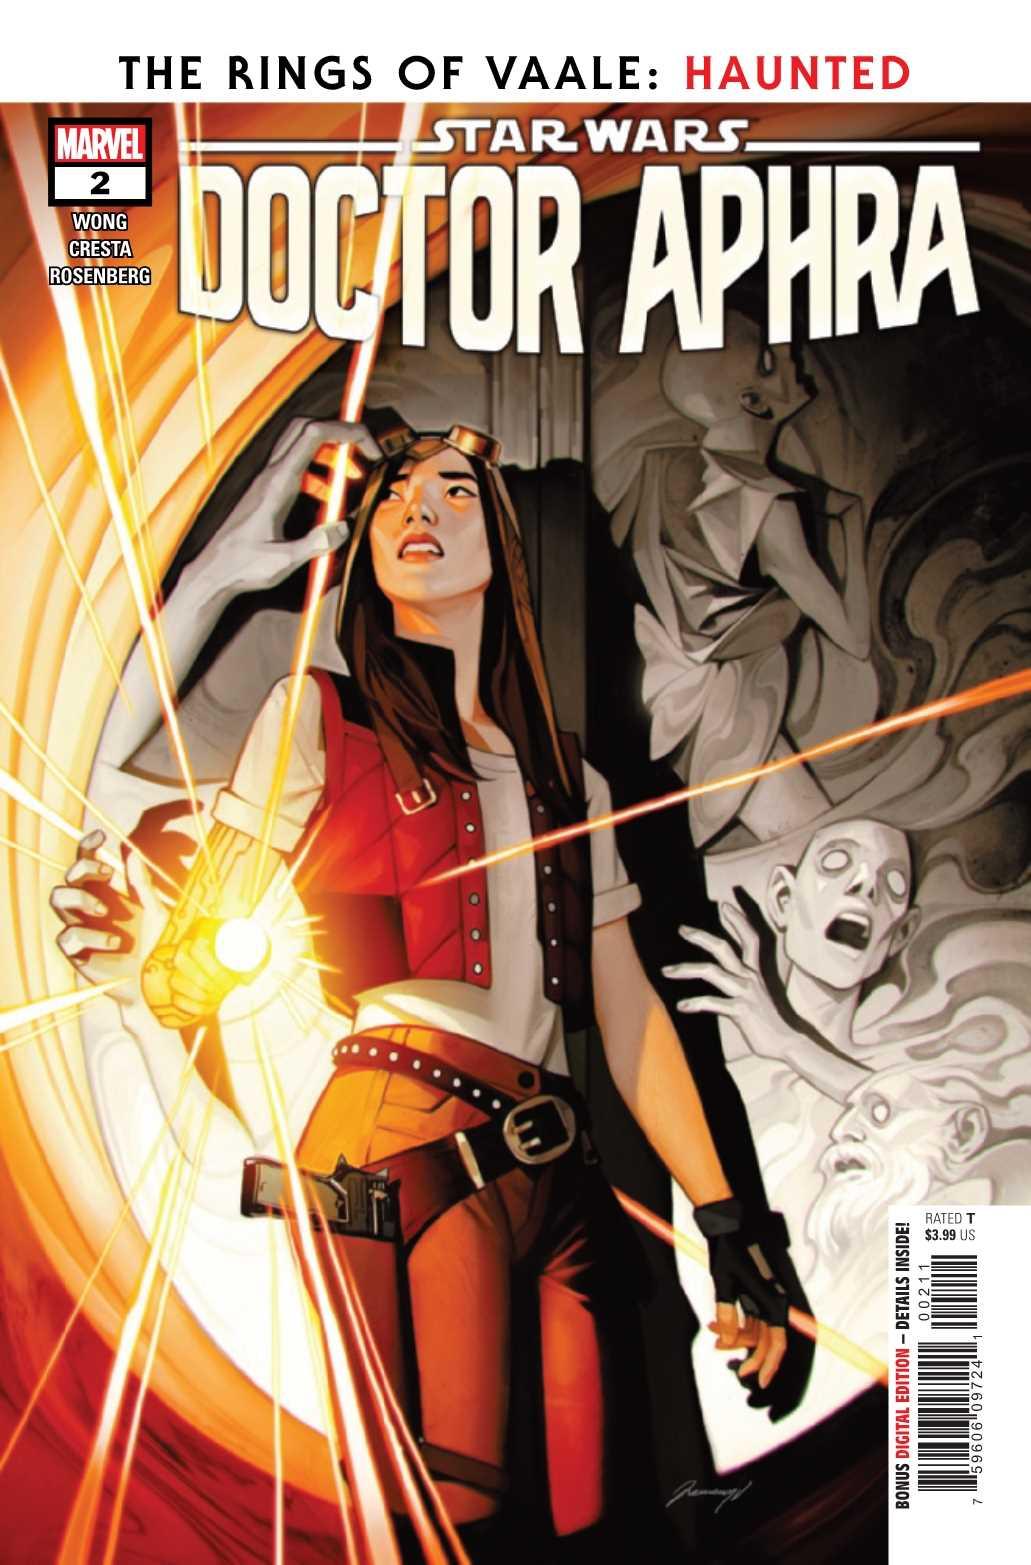 STAR WARS DOCTOR APHRA #2c